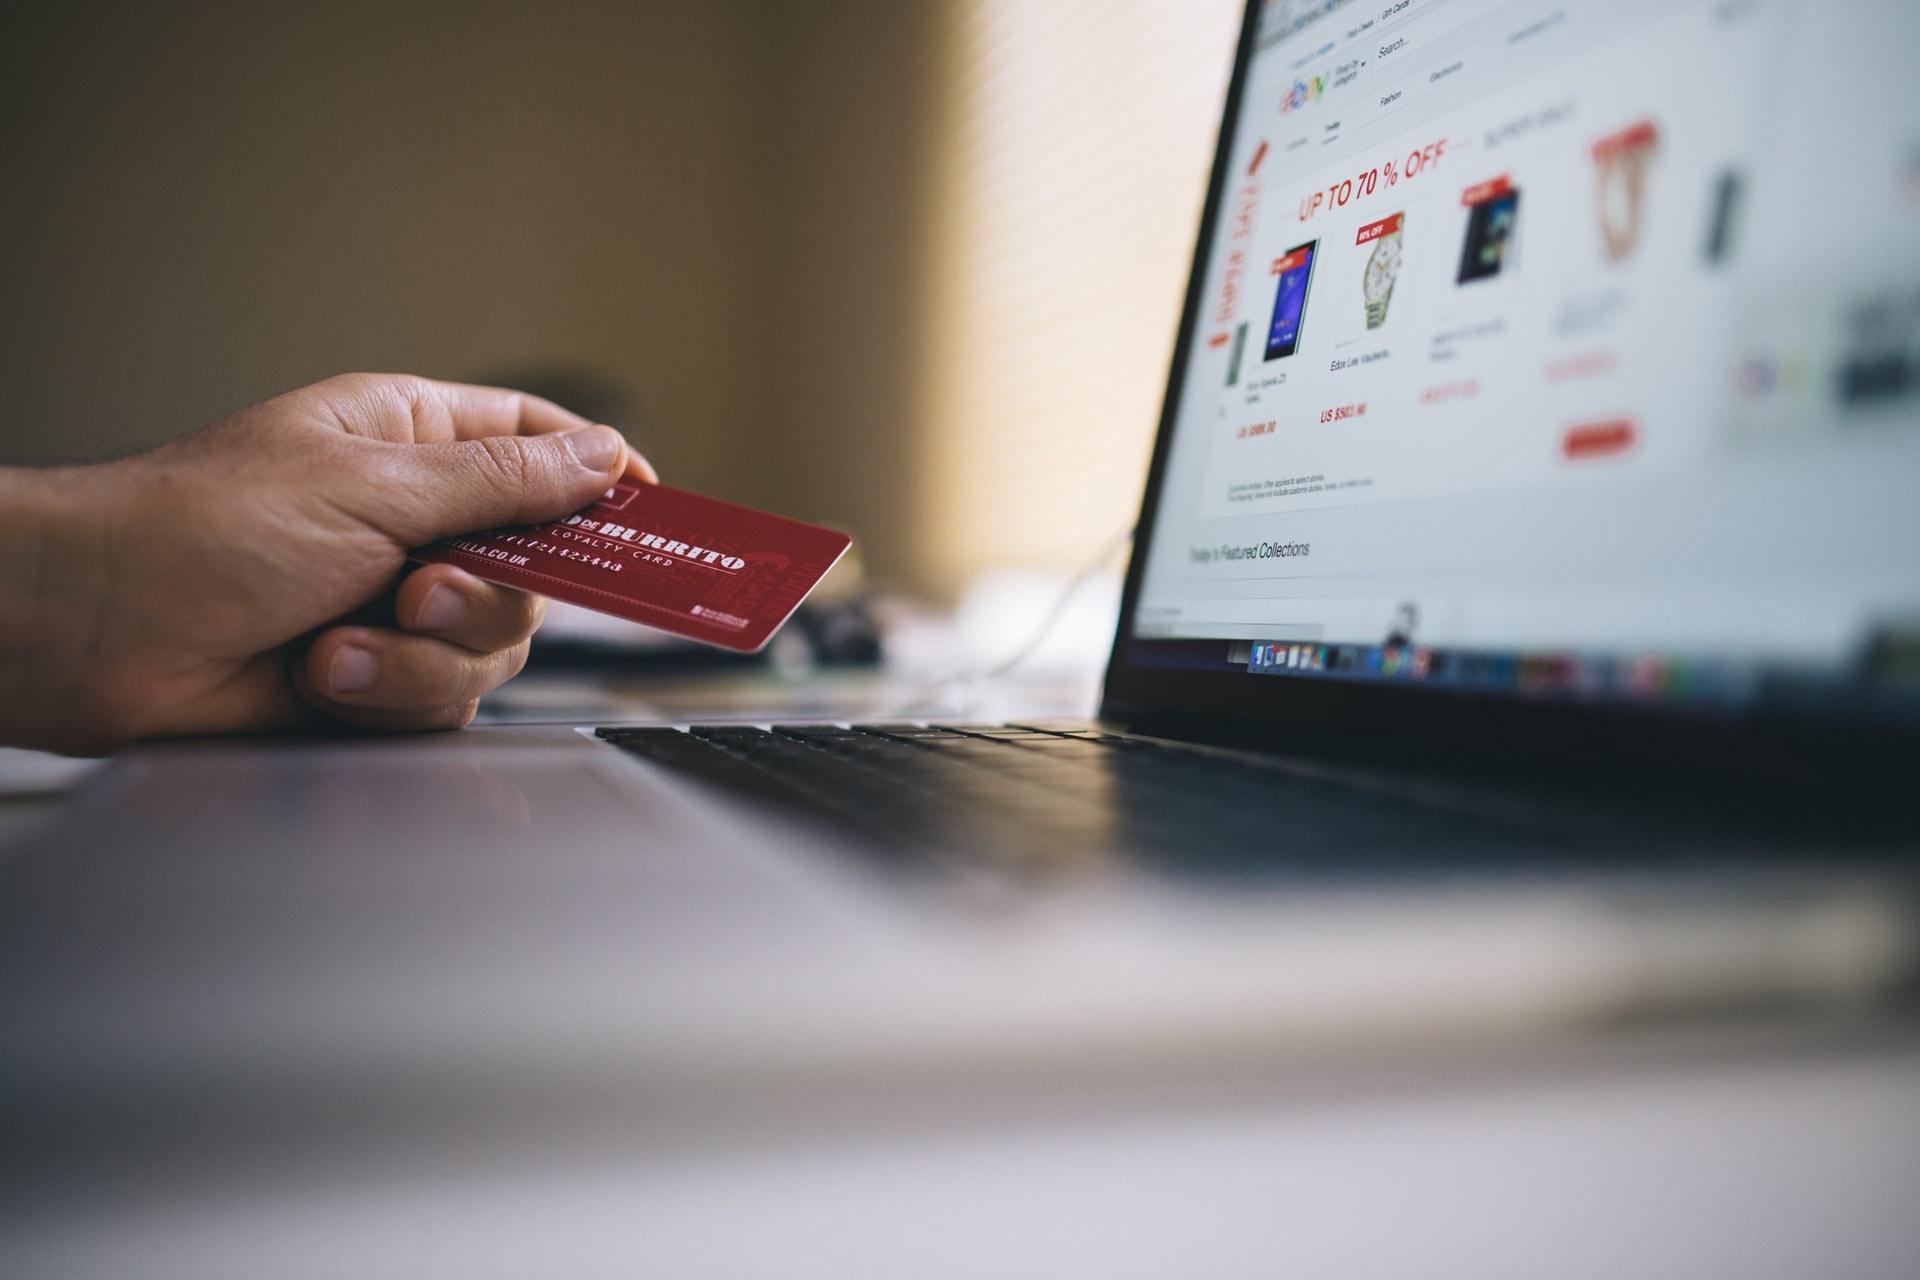 The Best Websites to Online Shop in Dubai